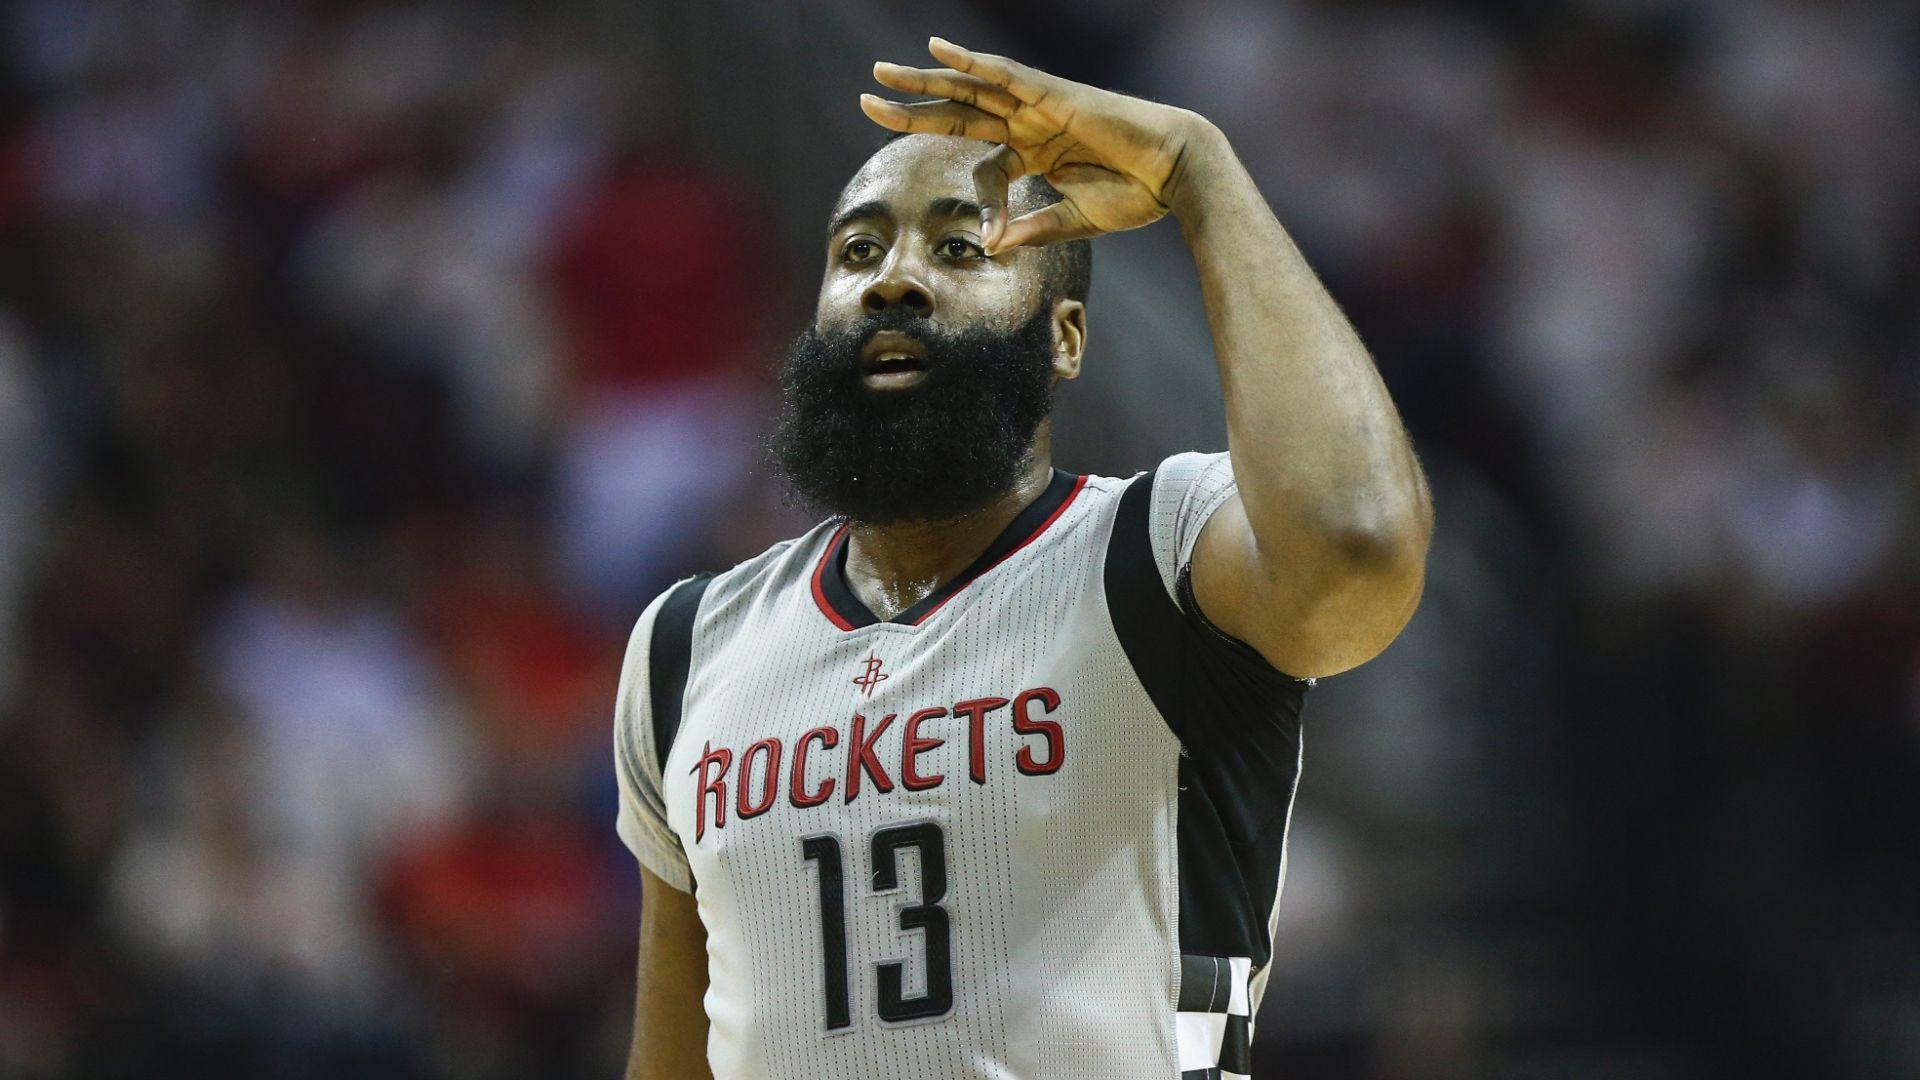 Harden's amazing season culminates with NBA's richest extension